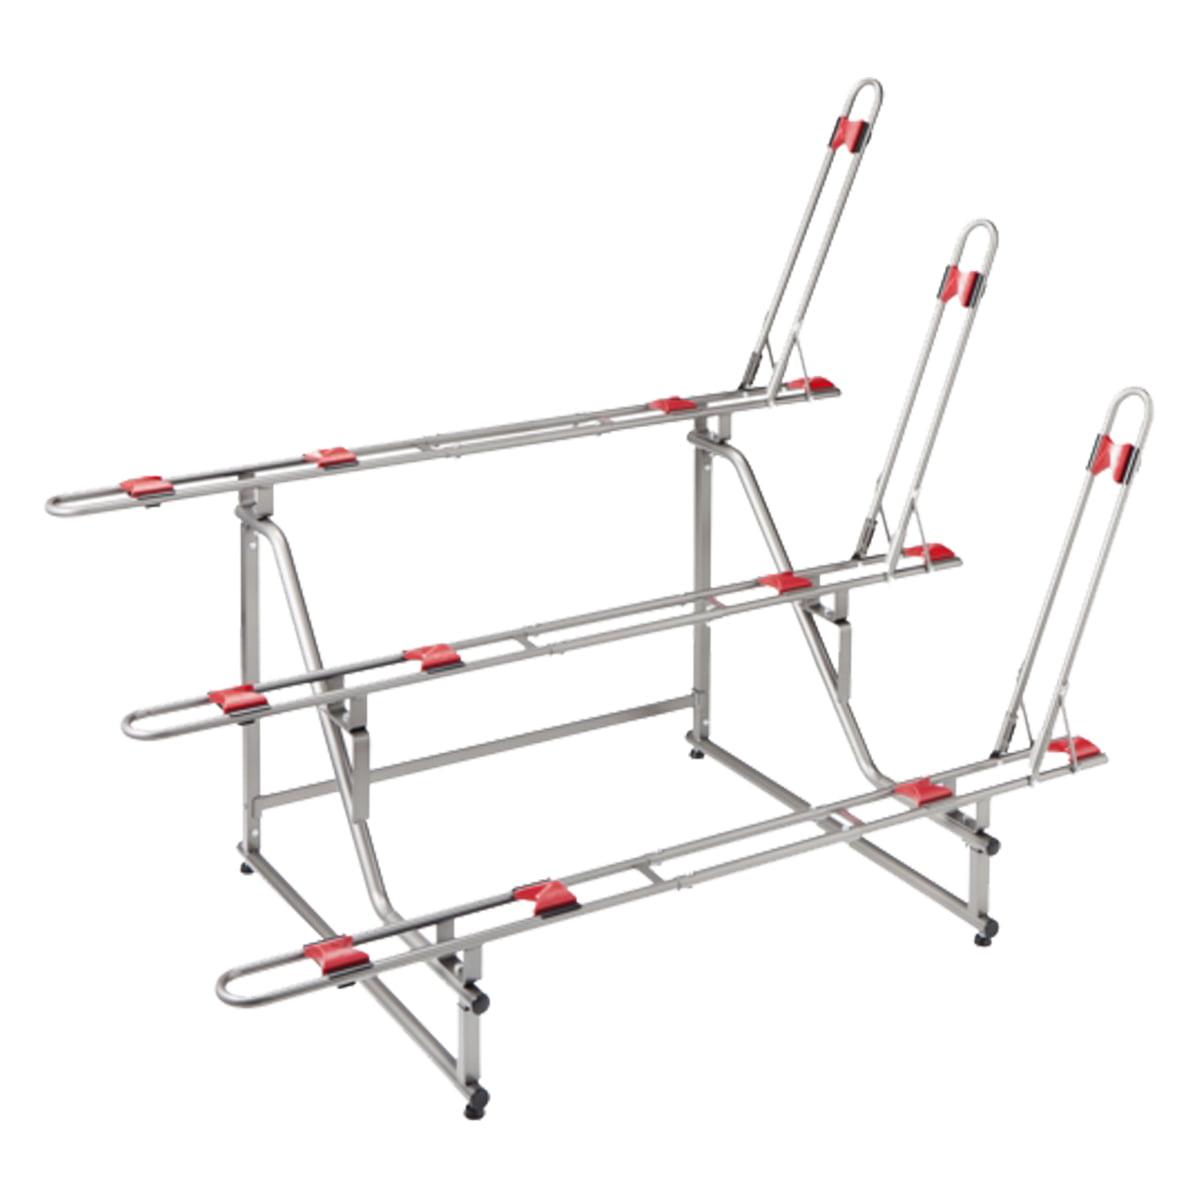 Minoura Ebs-3 Hd Tier 3-Bike Storage Stand Gray